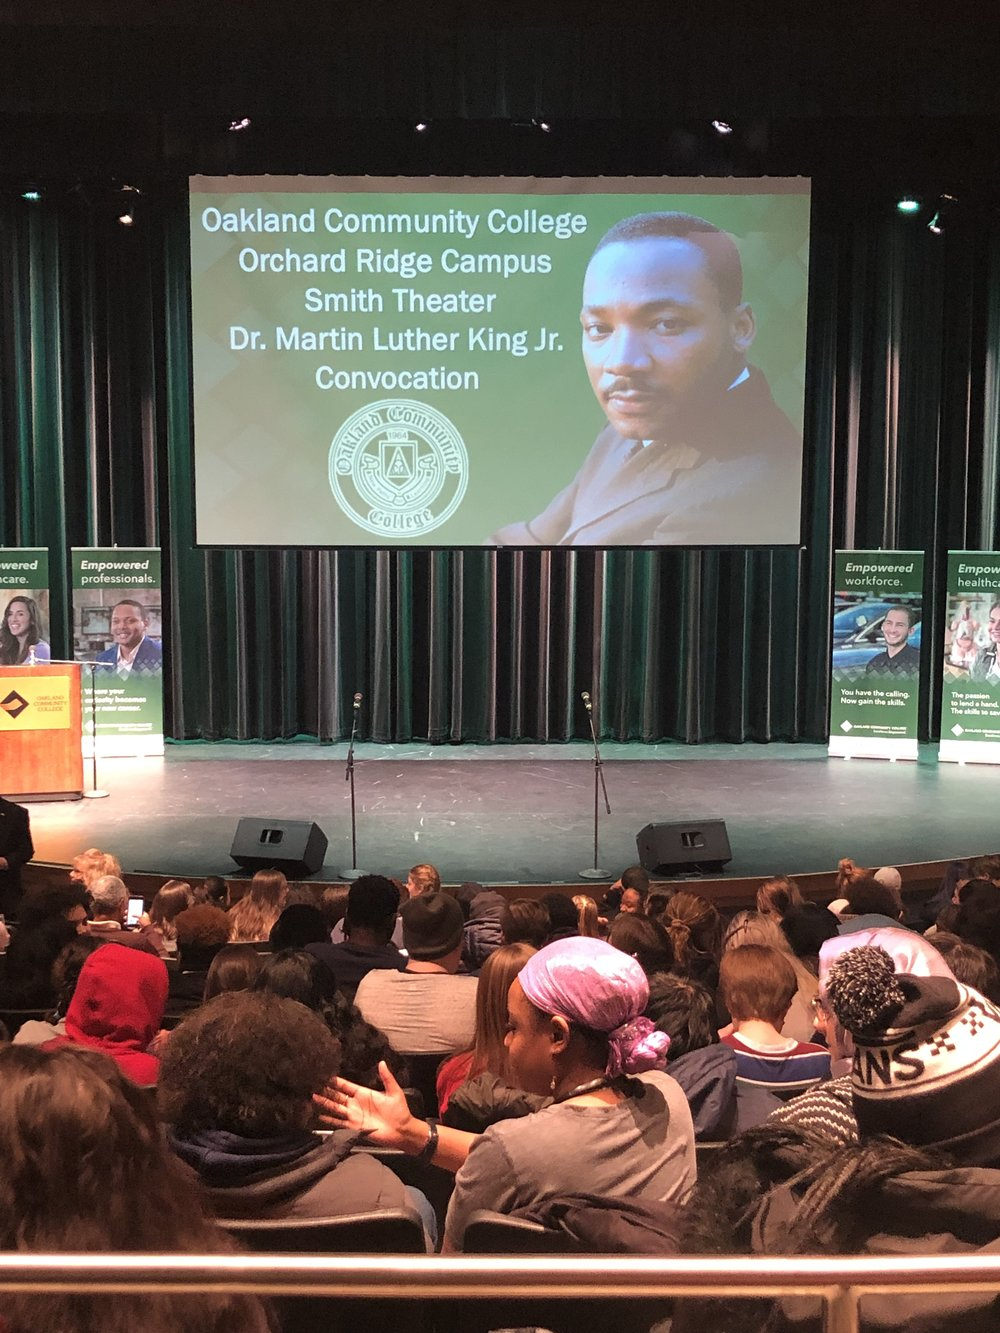 Let's Unite. Dr. Martin Luther King Jr. Convocation event at Oakland Community College, Farmington Hills campus